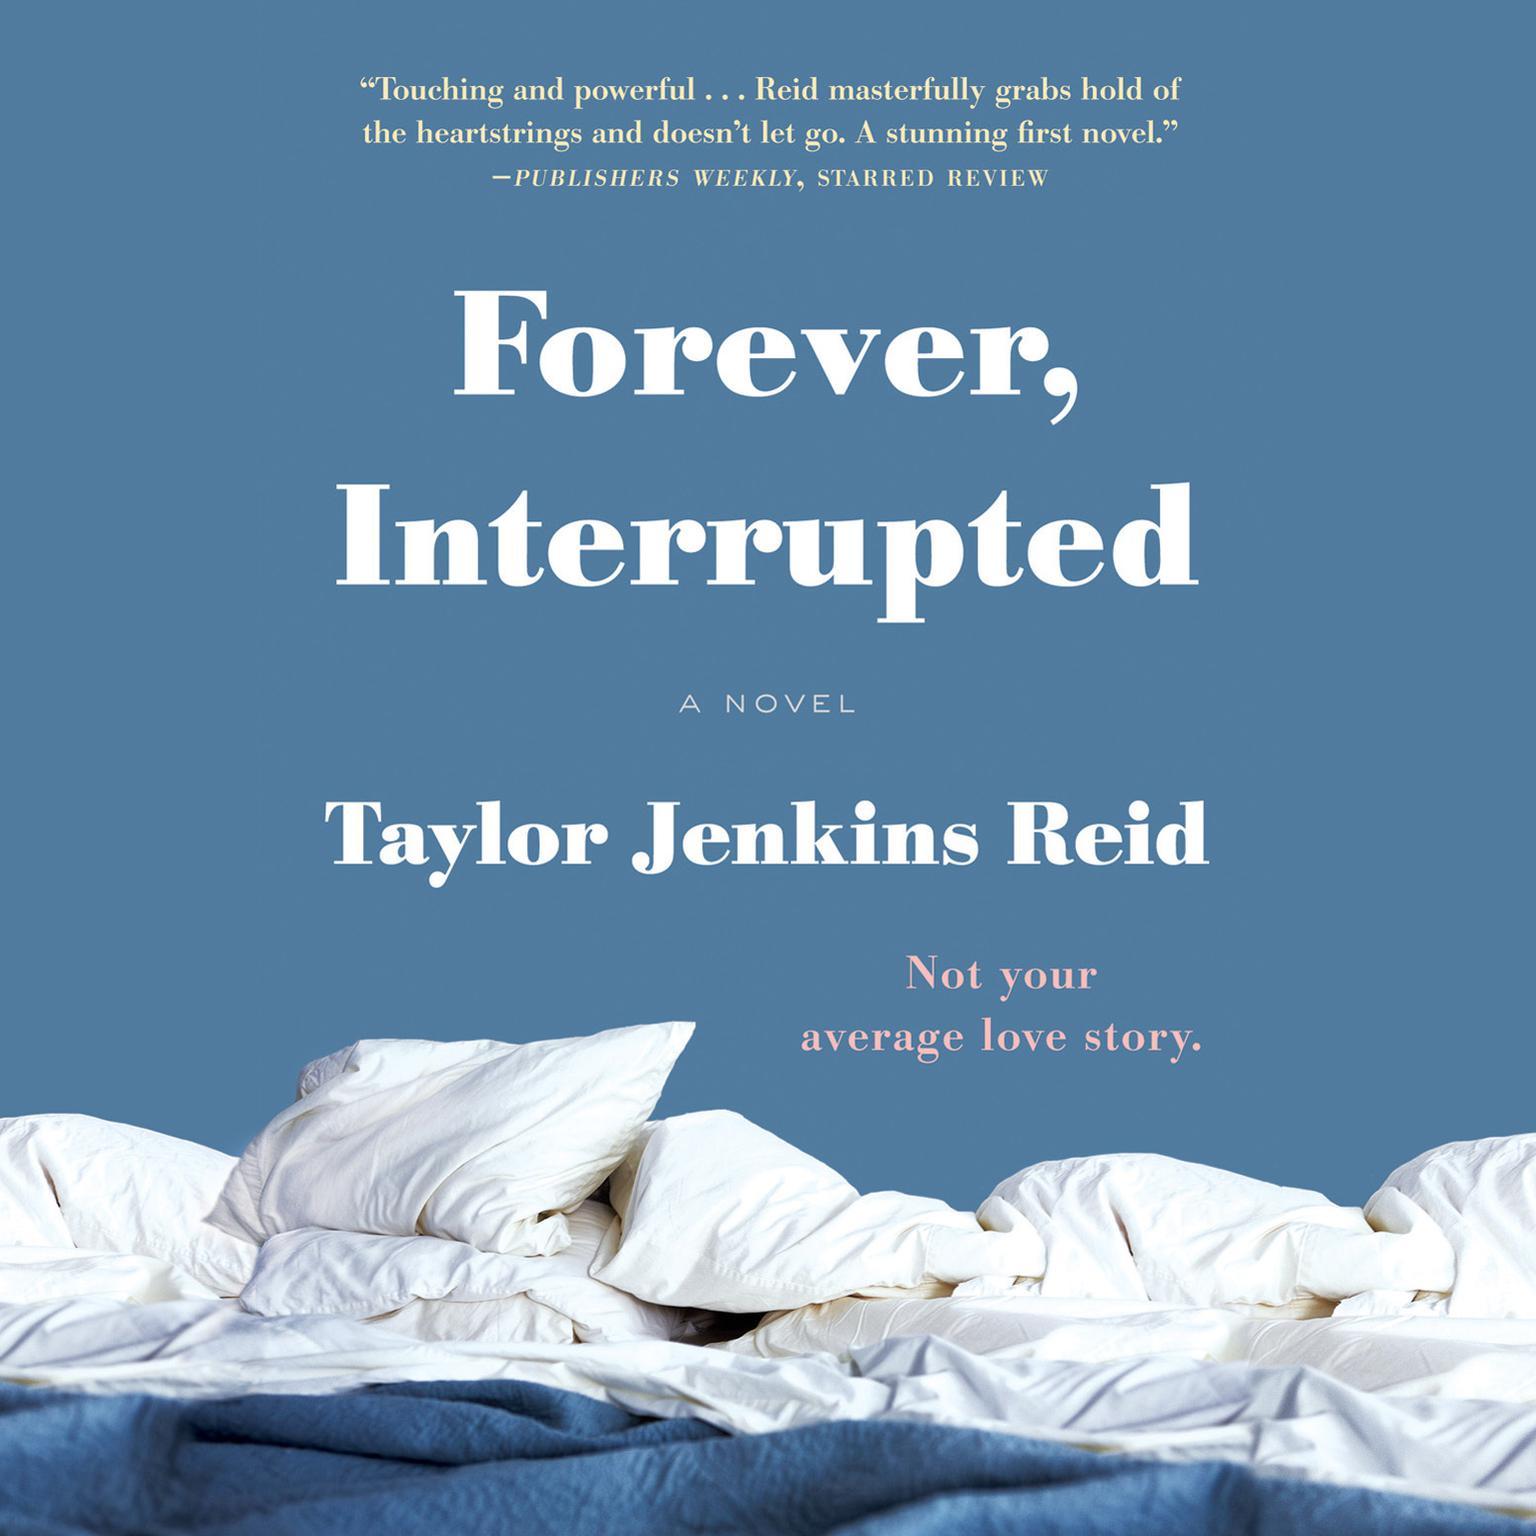 Forever, Interrupted: A Novel Audiobook, by Taylor Jenkins Reid